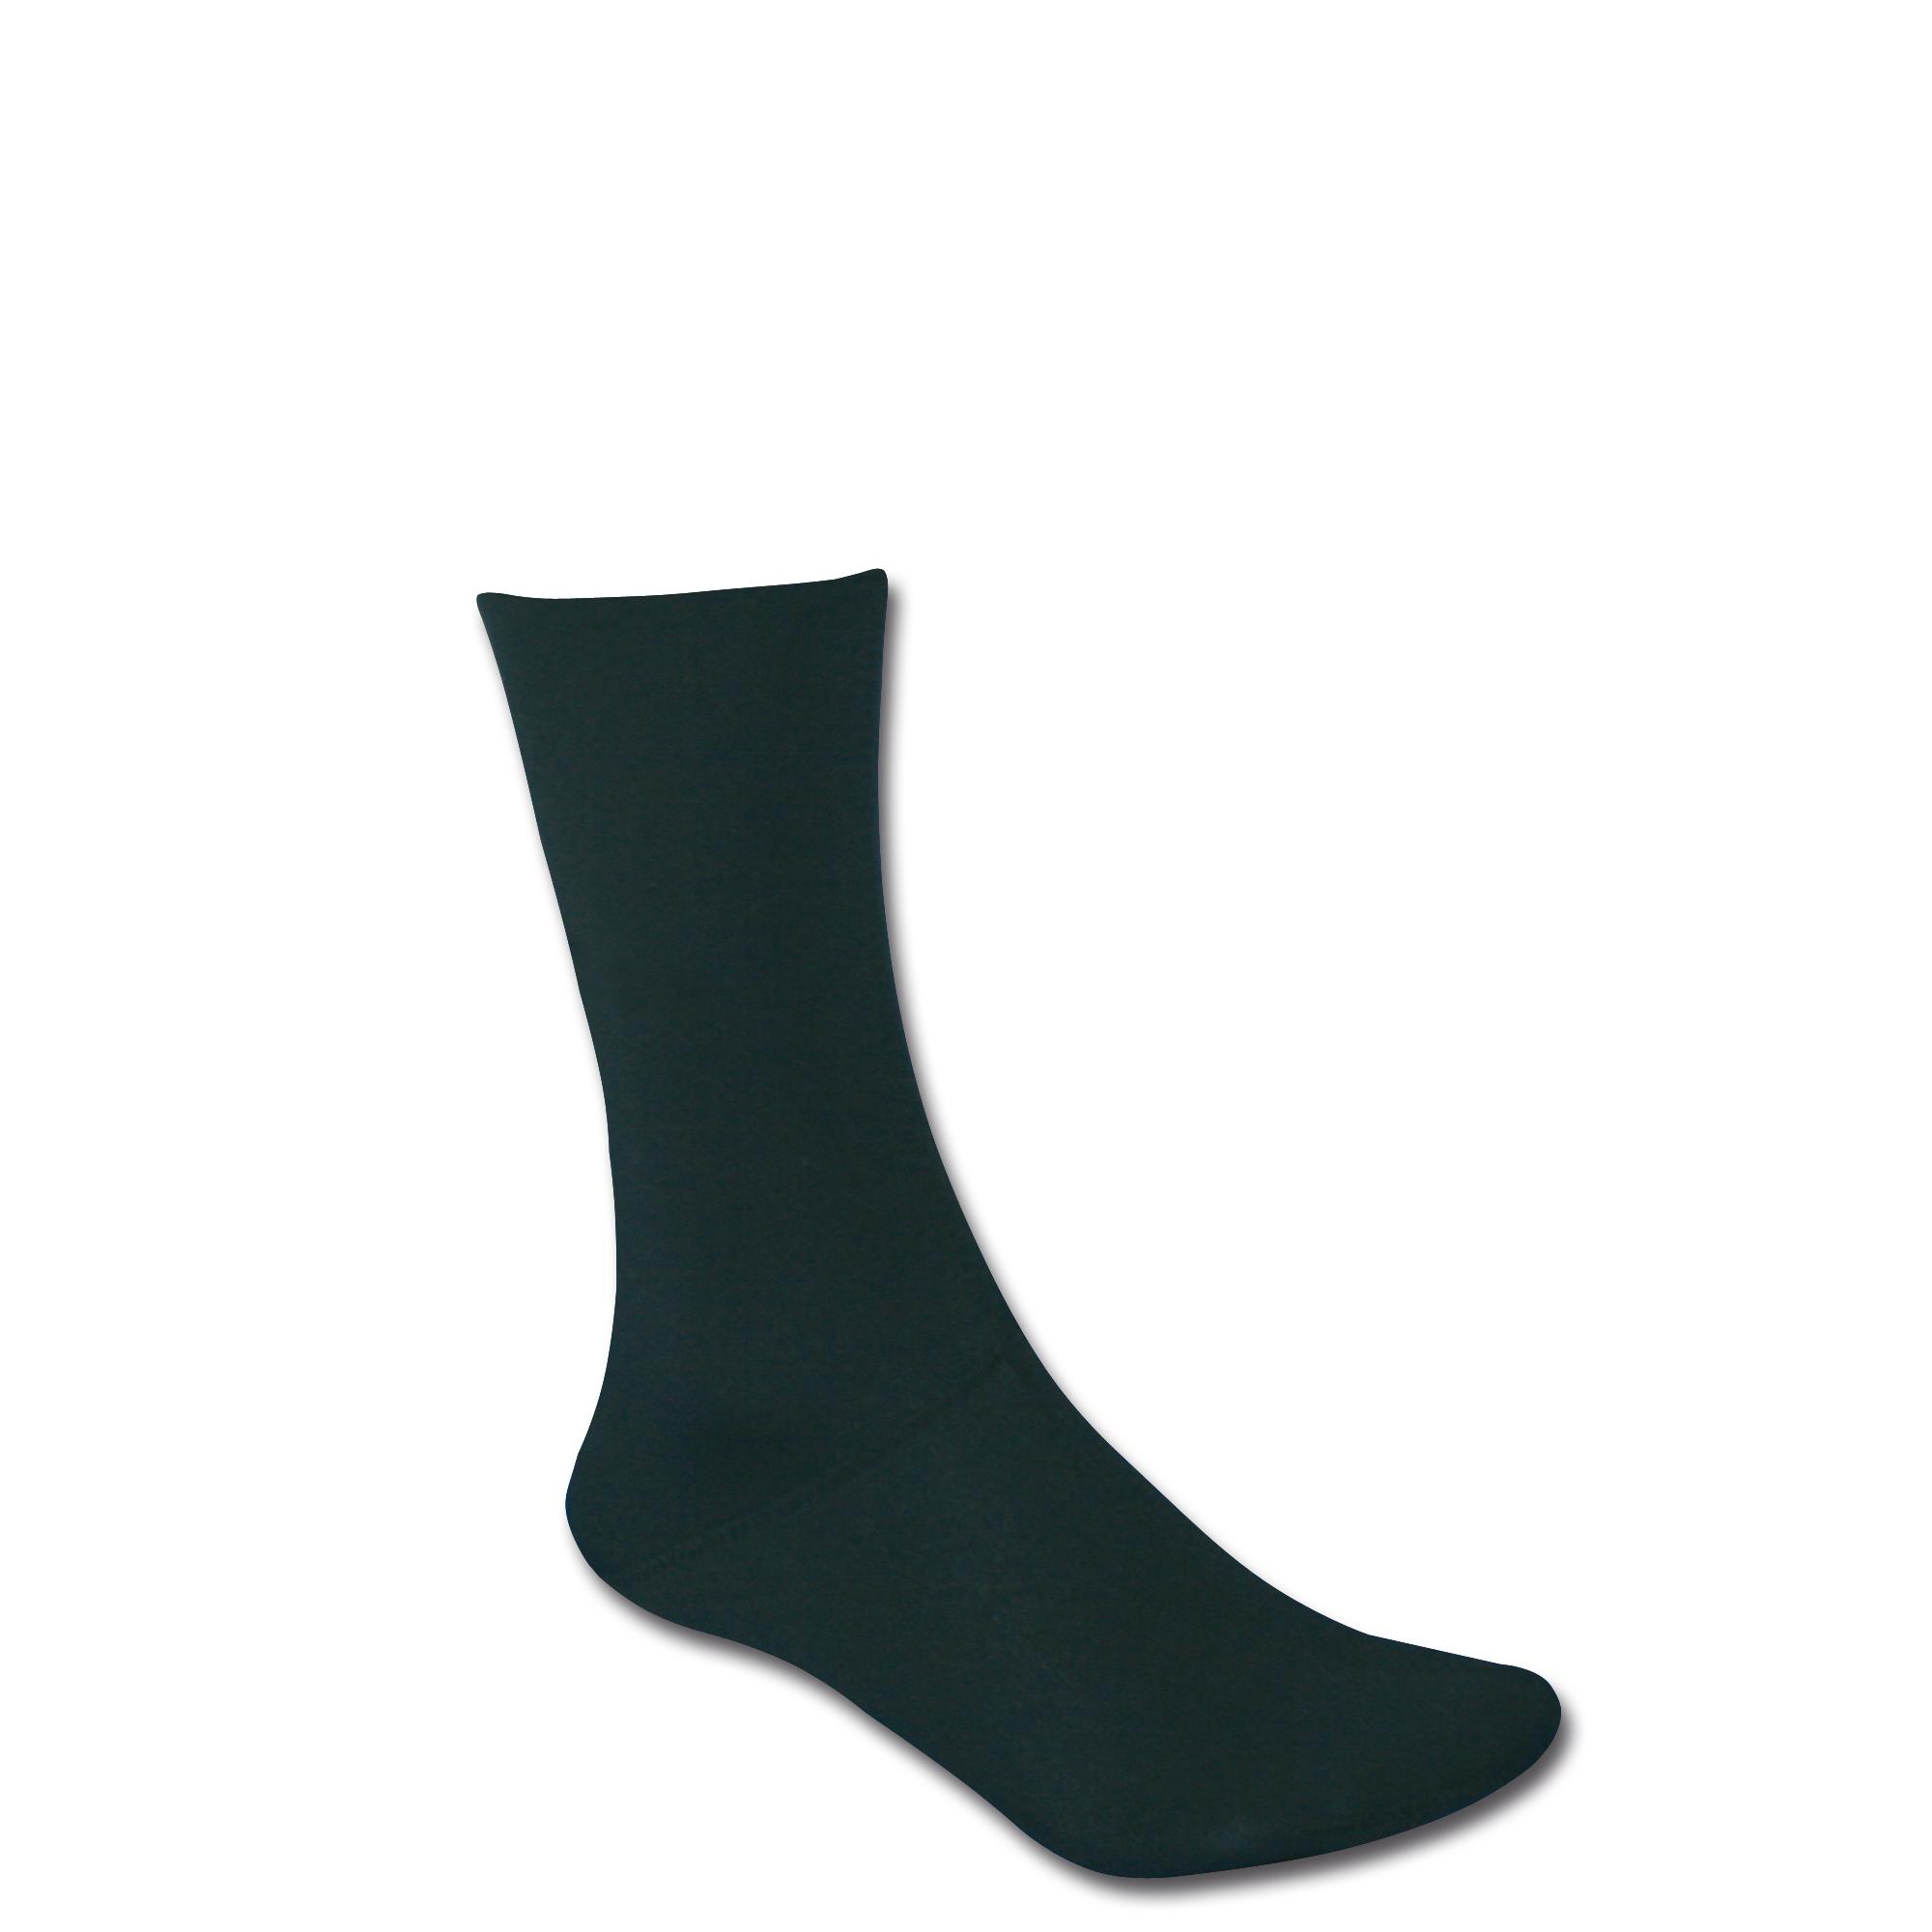 Gator Neopren Socken schwarz